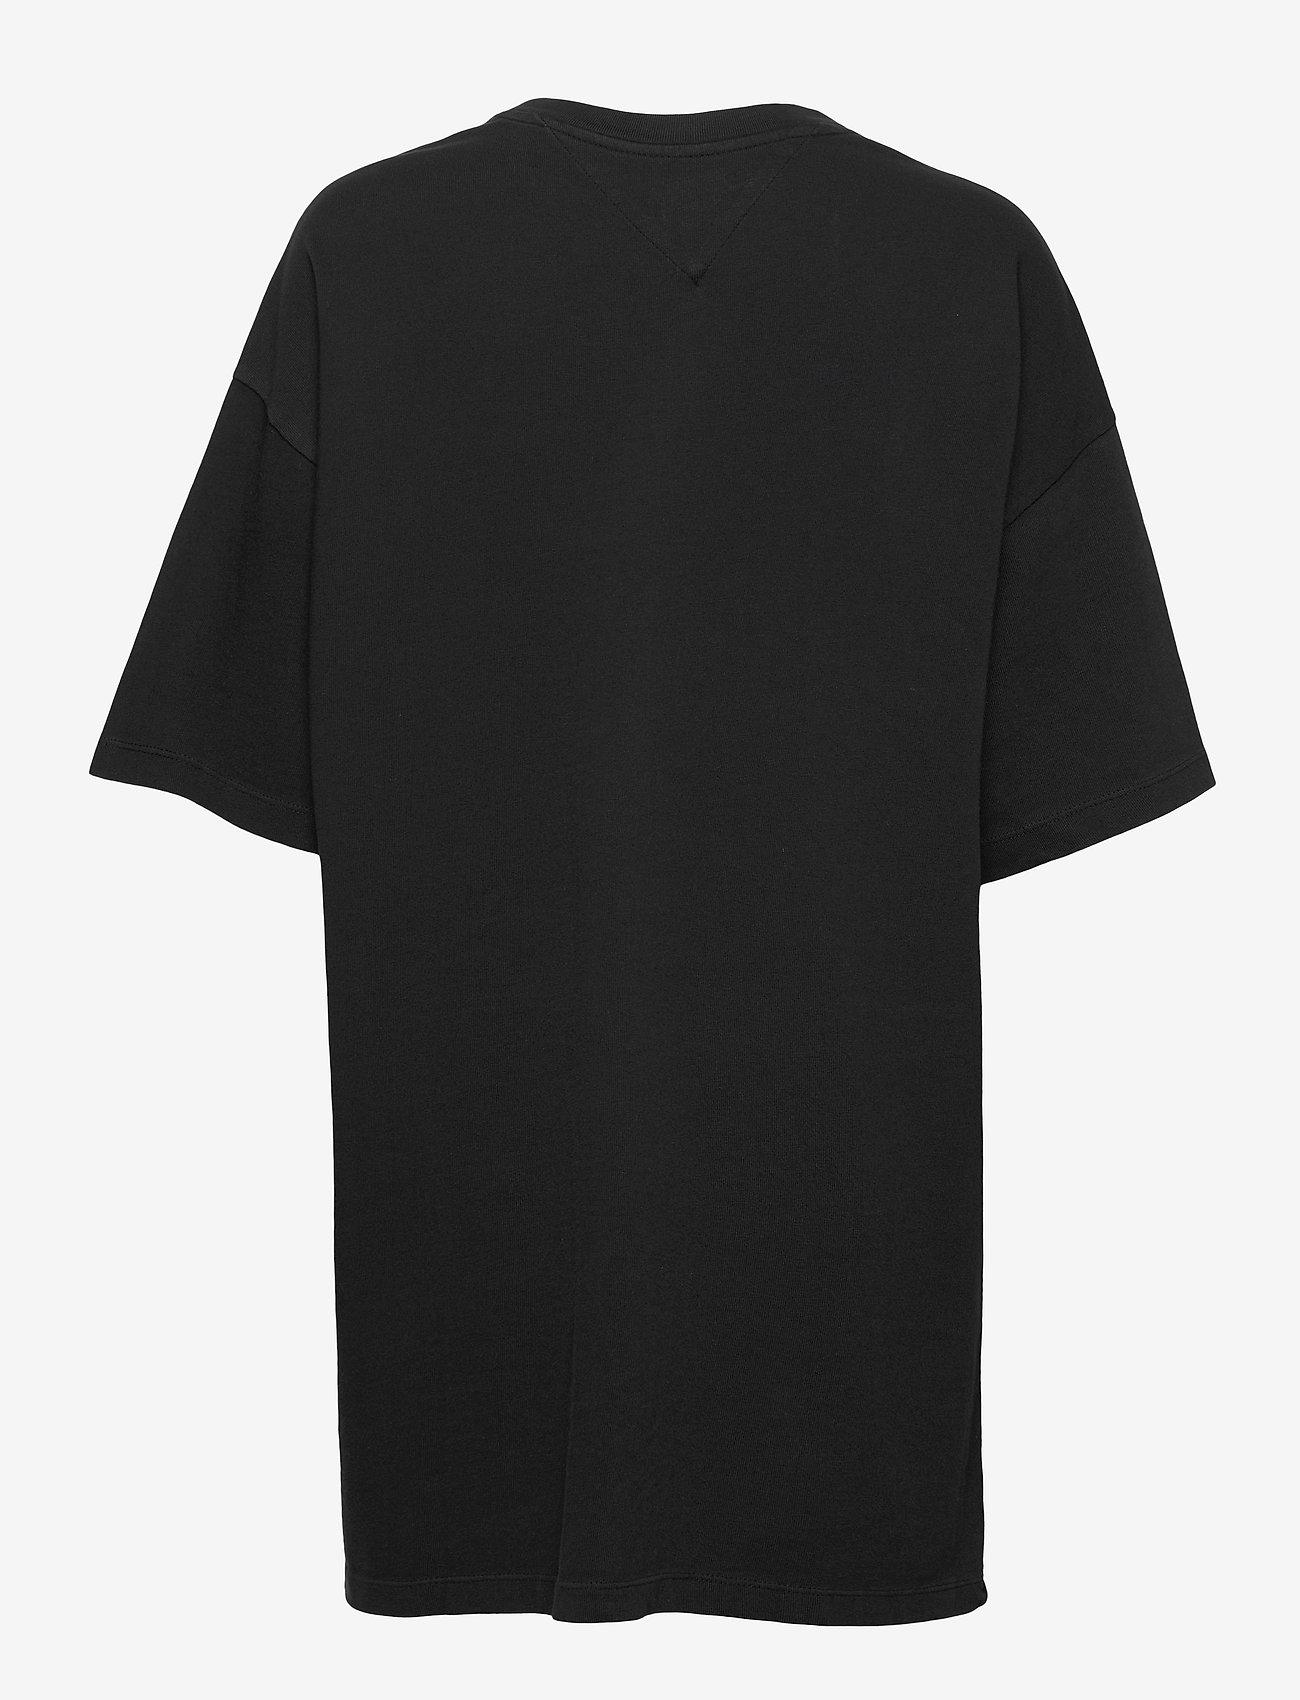 Tommy Jeans - TJW OVERSIZED BADGE TEE DRESS - t-shirts - black - 1